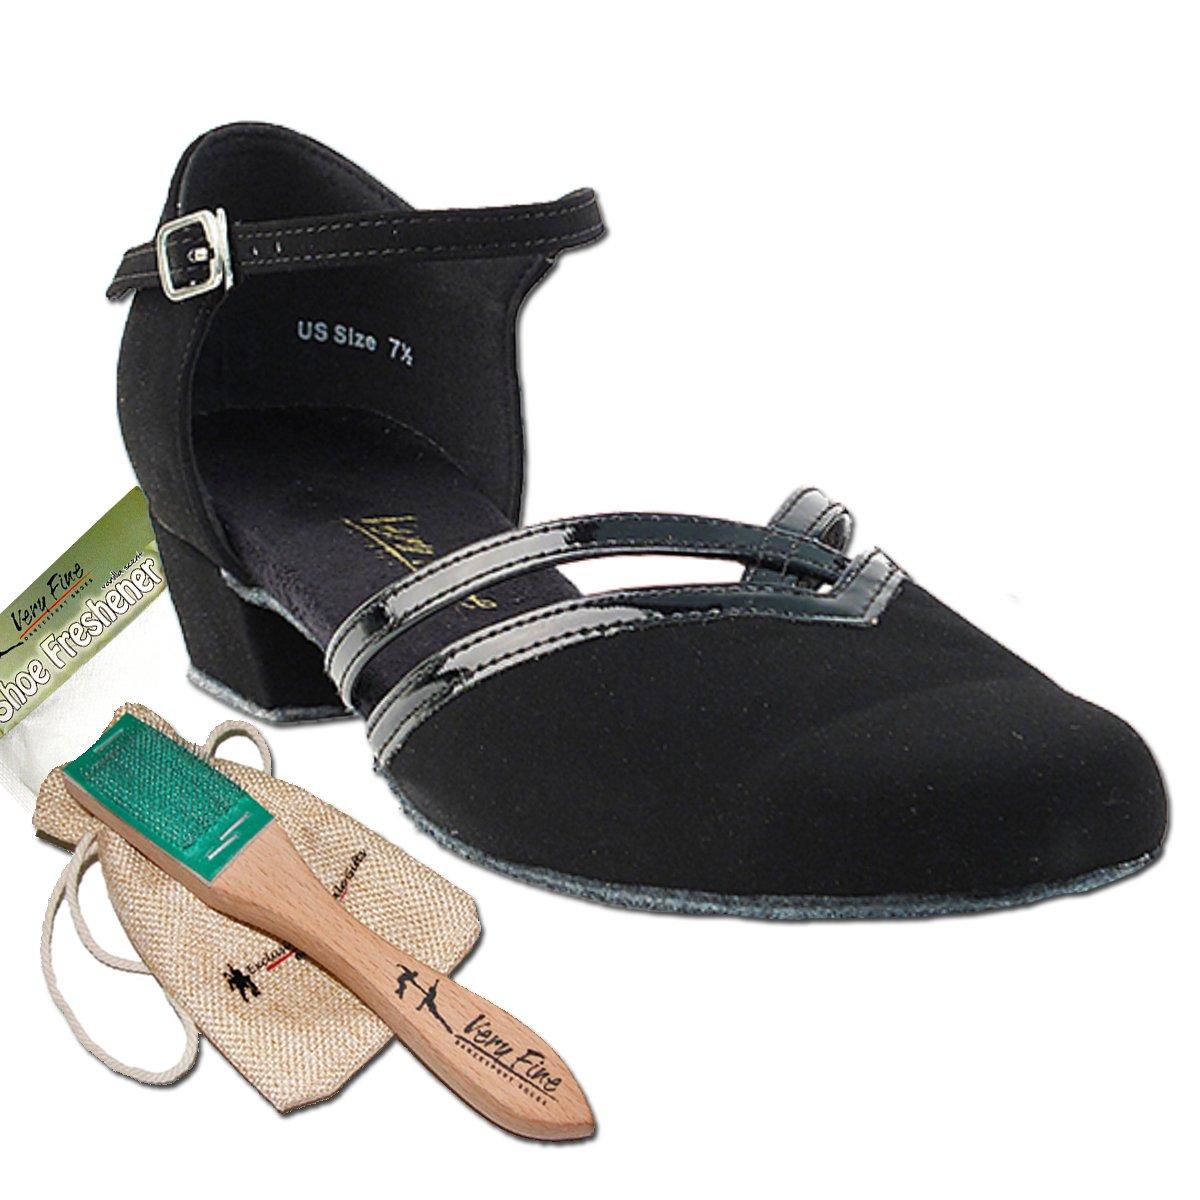 Womens Ballroom Dance Shoes Party Salsa Practice Shoes Black Nubuck 8881EB Comfortable - Very Fine 1'' Heel 8 M US [Bundle of 5]